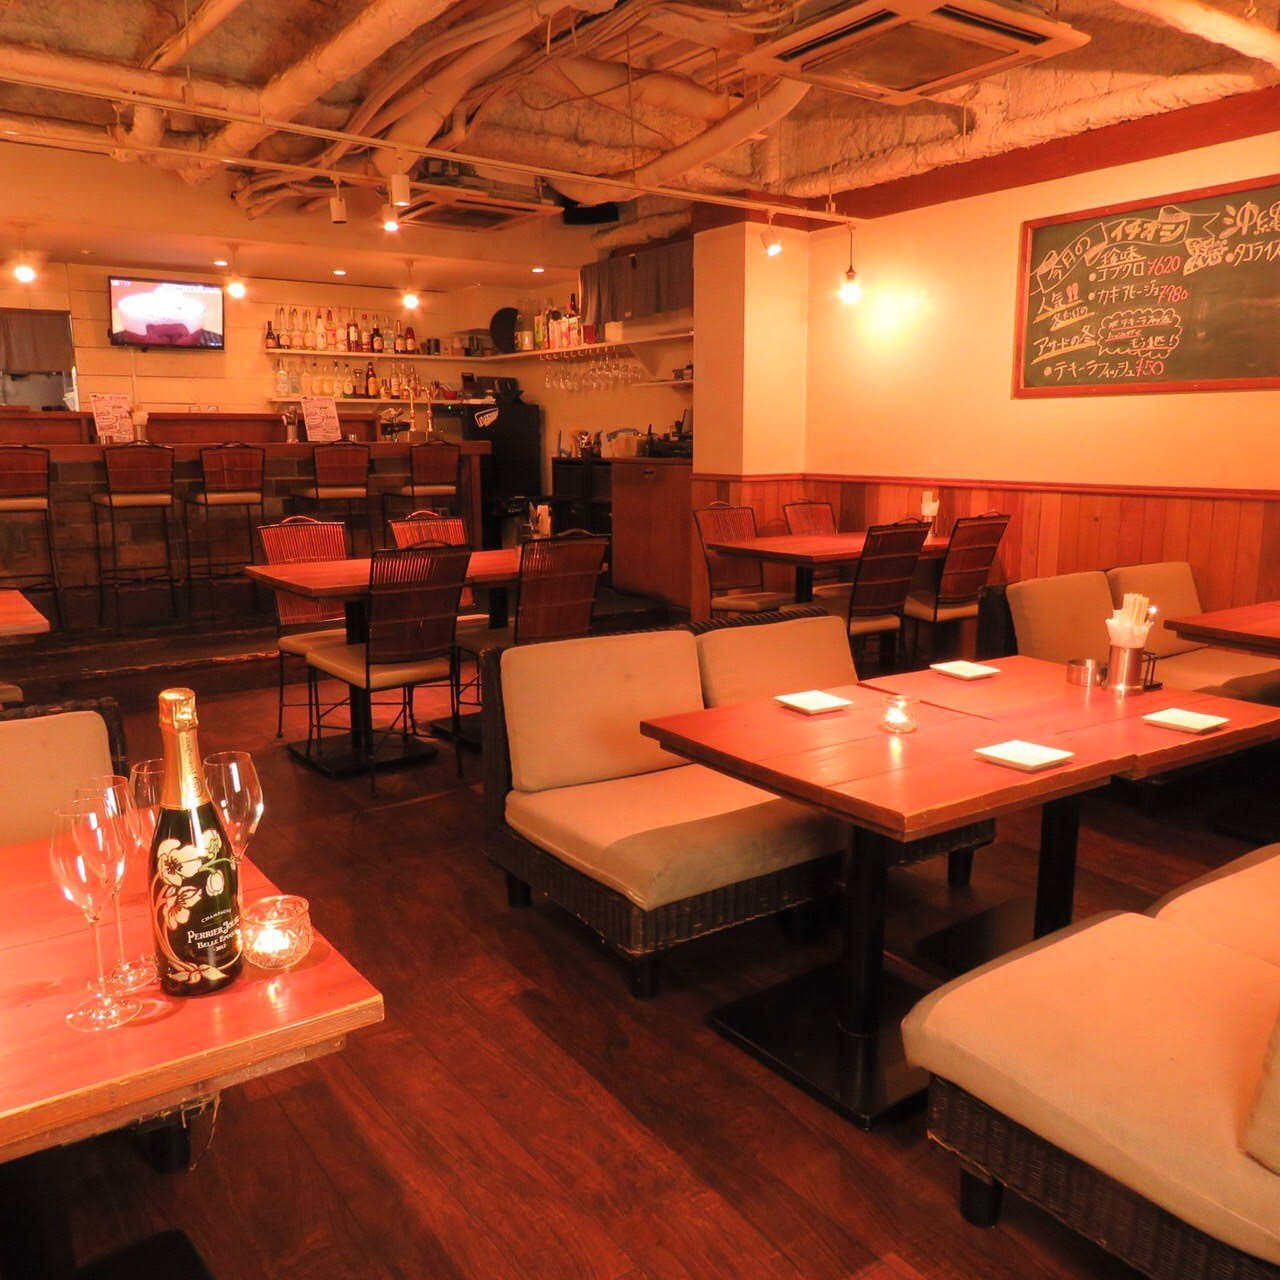 Dining Bar Asado アサード 天神大名 メニュー 結婚式二次会向き